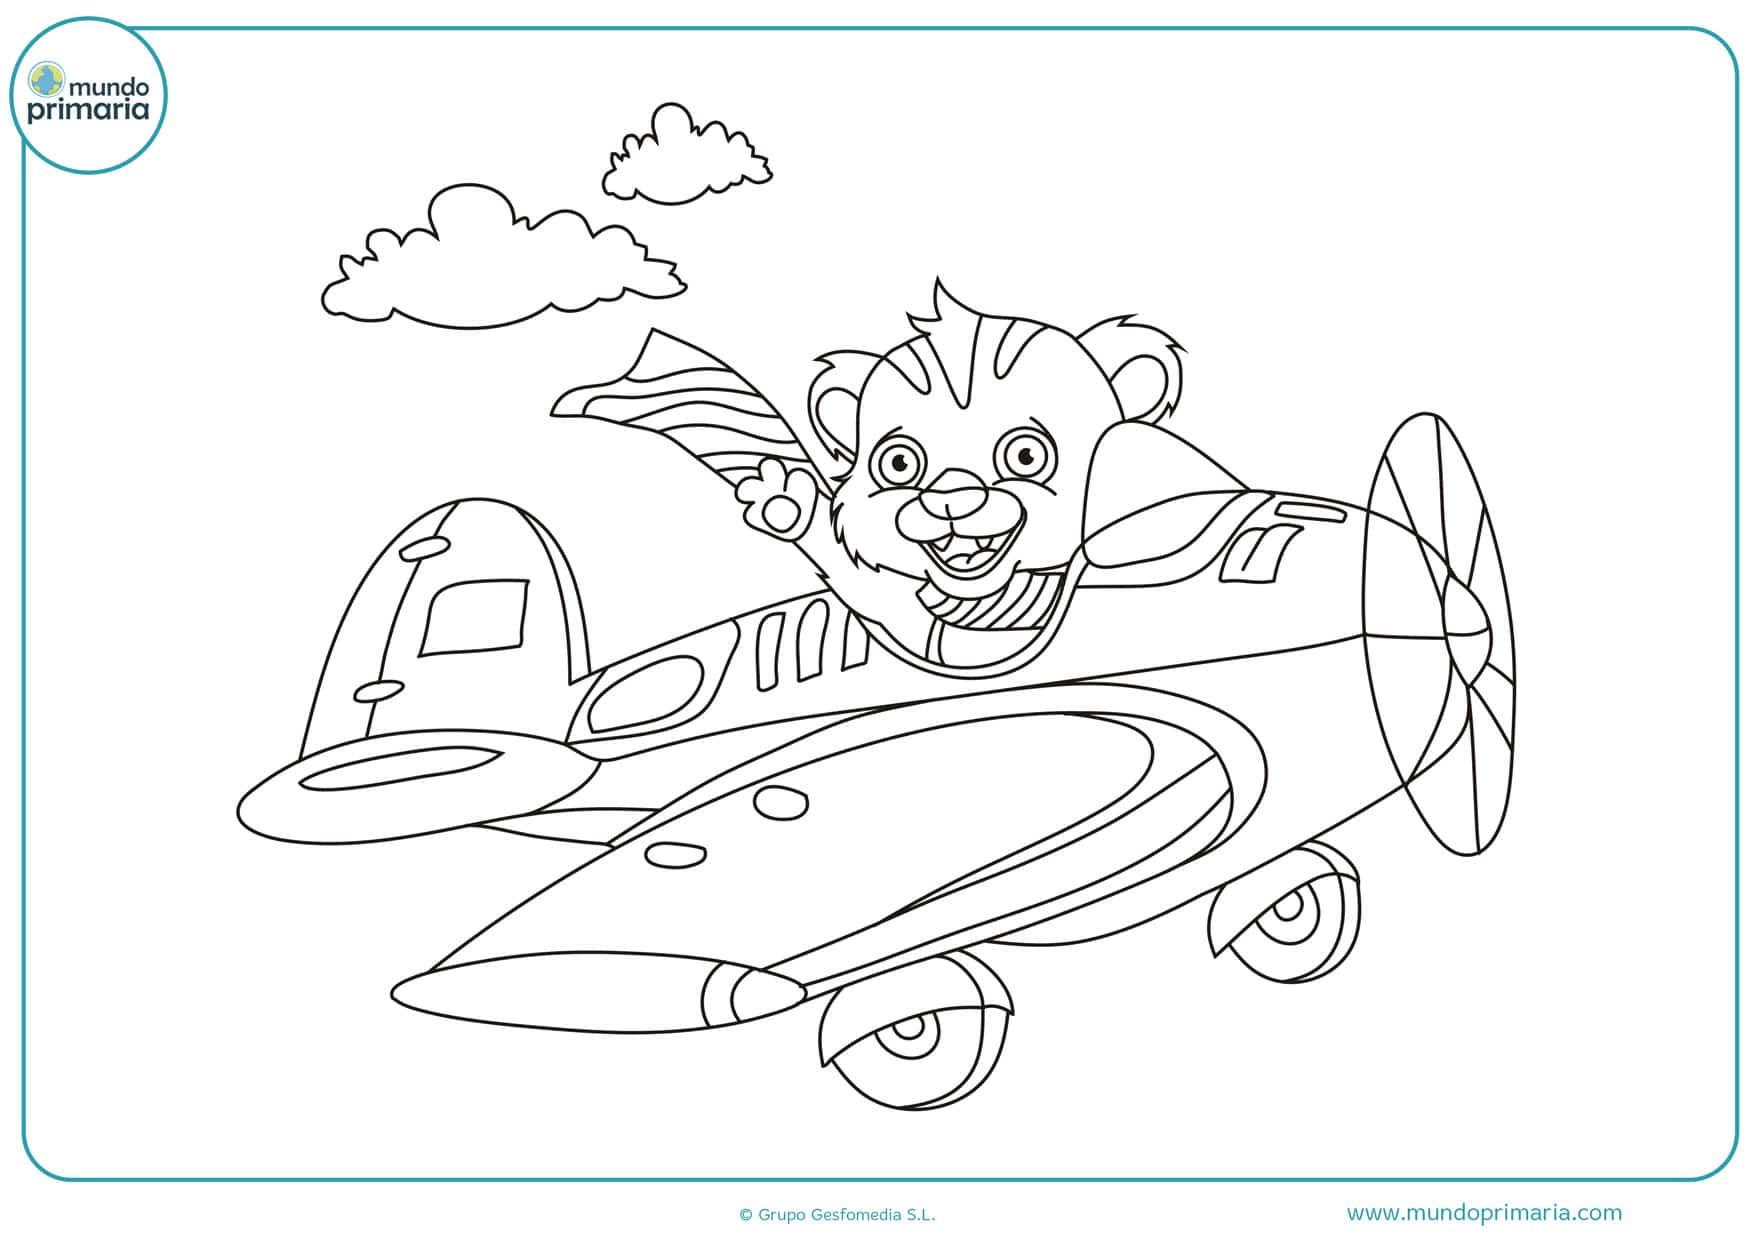 dibujos de avionetas divertidos para pintar